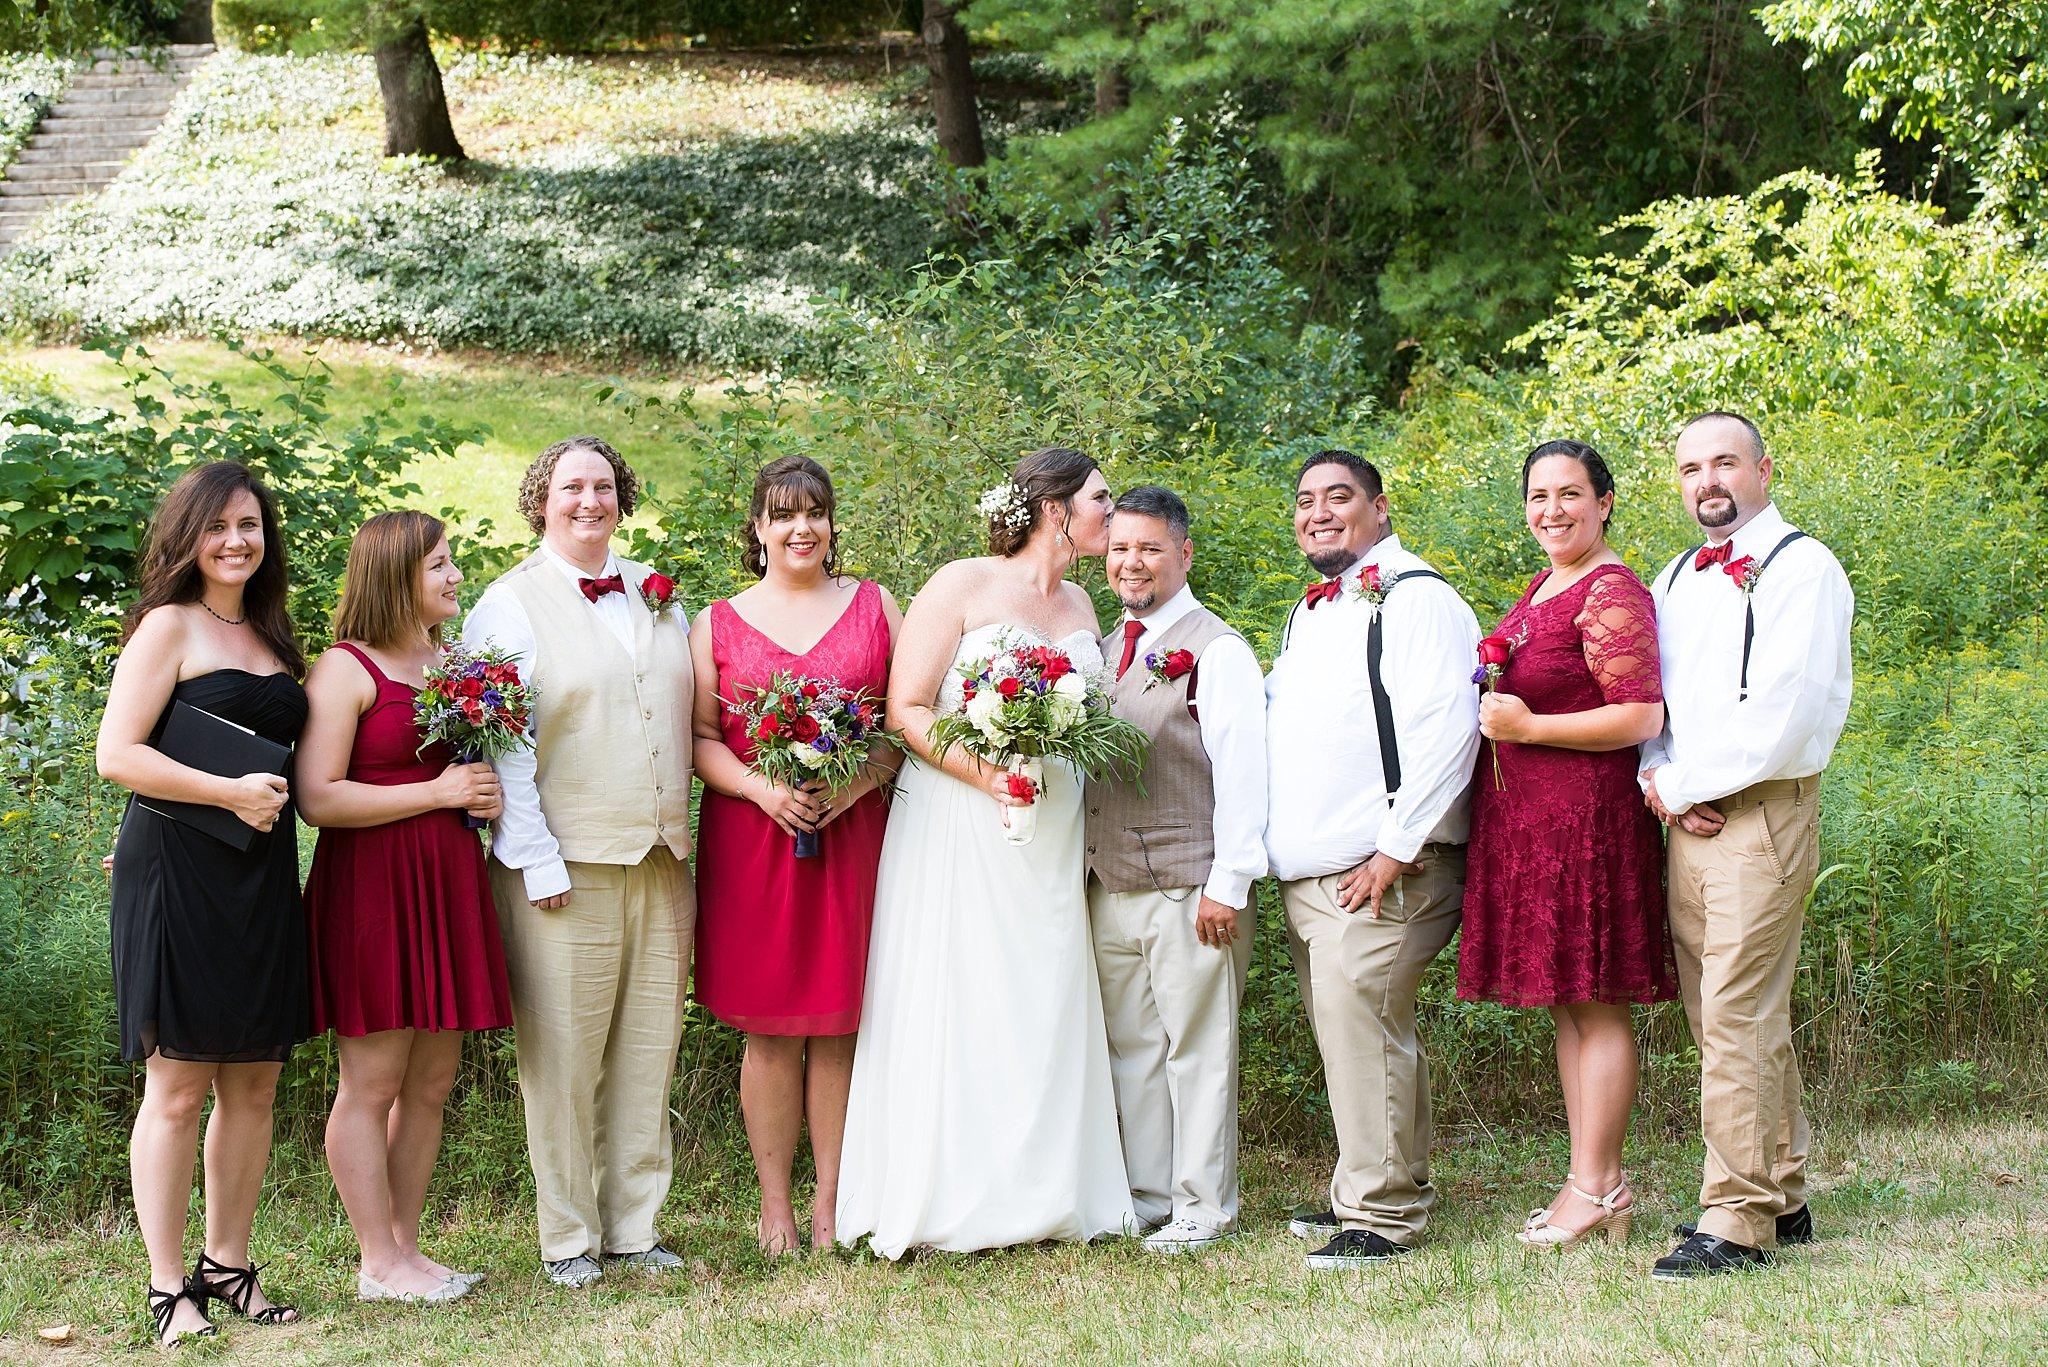 new england wedding photographer 6.jpg